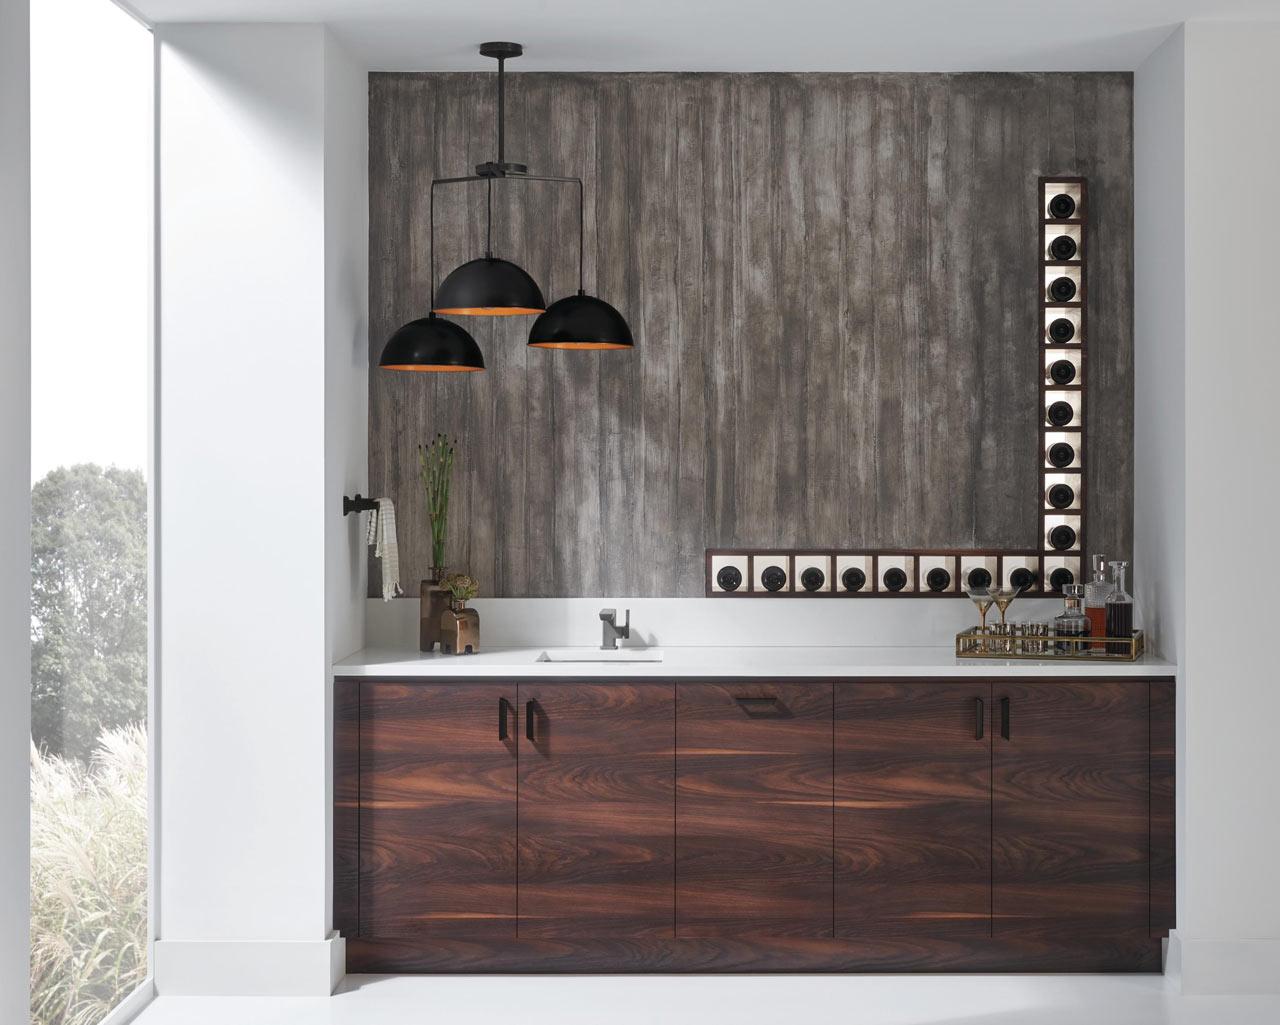 brizo kitchen faucet latest designs 简约却不简单 vettis 限量款混凝土水龙头 水龙头 混凝土